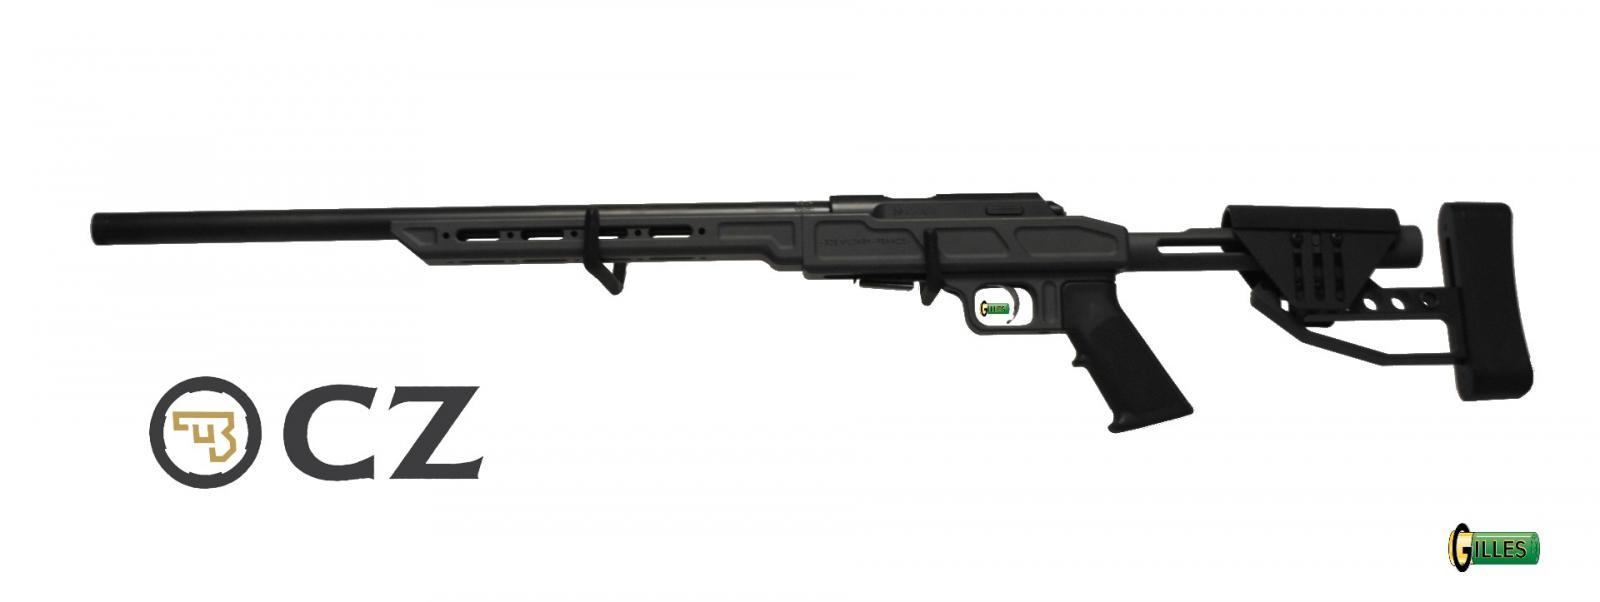 Carabine CZ 457 SDS MILITARY MATCH